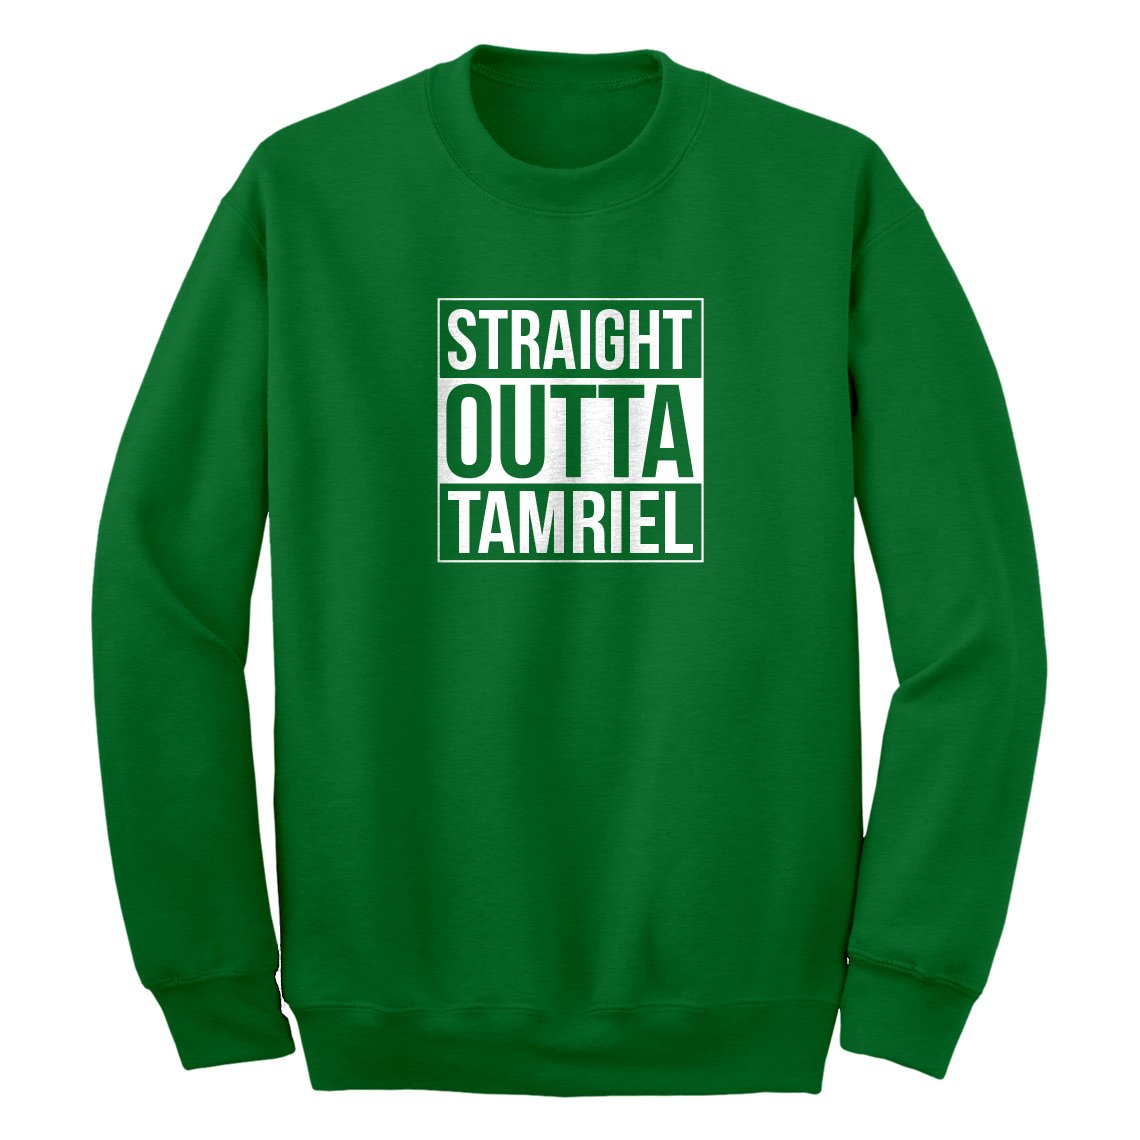 Indica Plateau Straight Outta Tamriel Unisex Adult Sweatshirt 3703-C